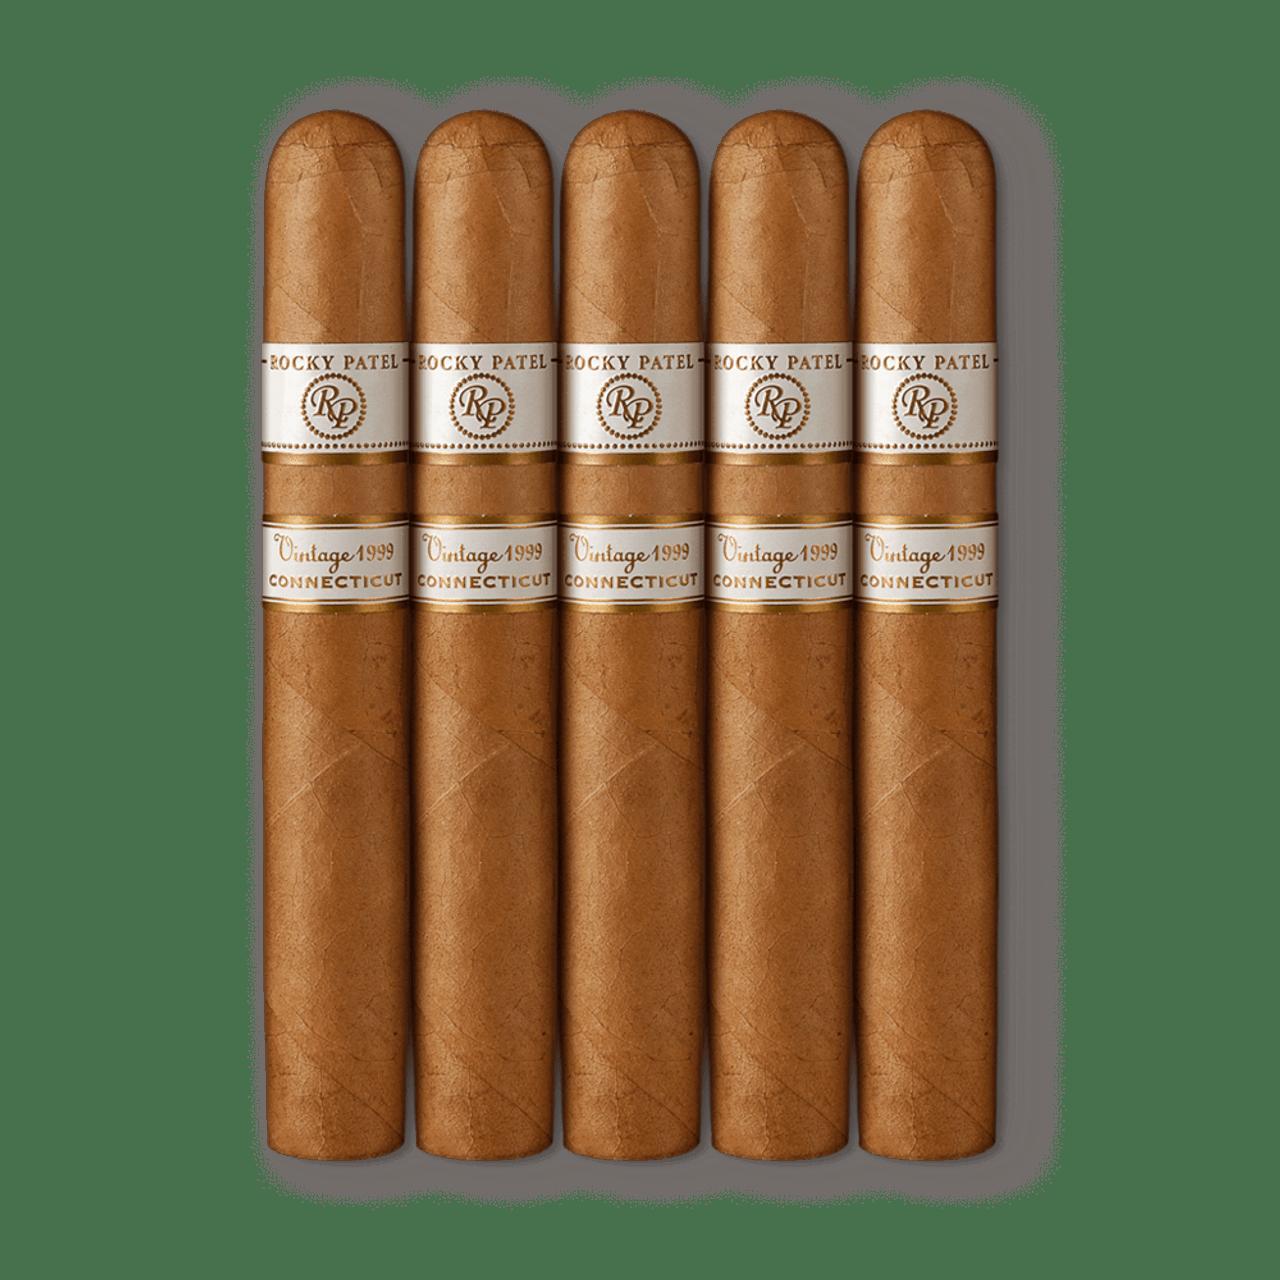 Rocky Patel Vintage 1999 Robusto Cigars - 5.5 x 50 (Pack of 5)